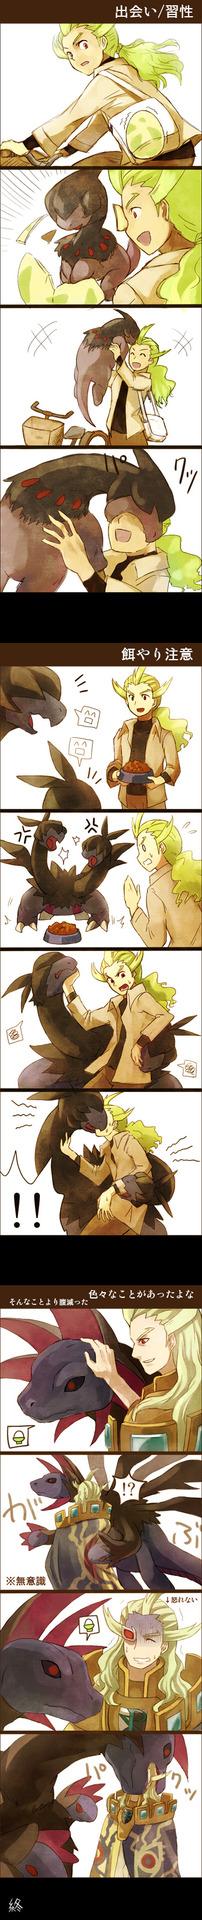 Ghetsis Daw! Preventing the King of Team Plasma can resist loving Pokemon XD